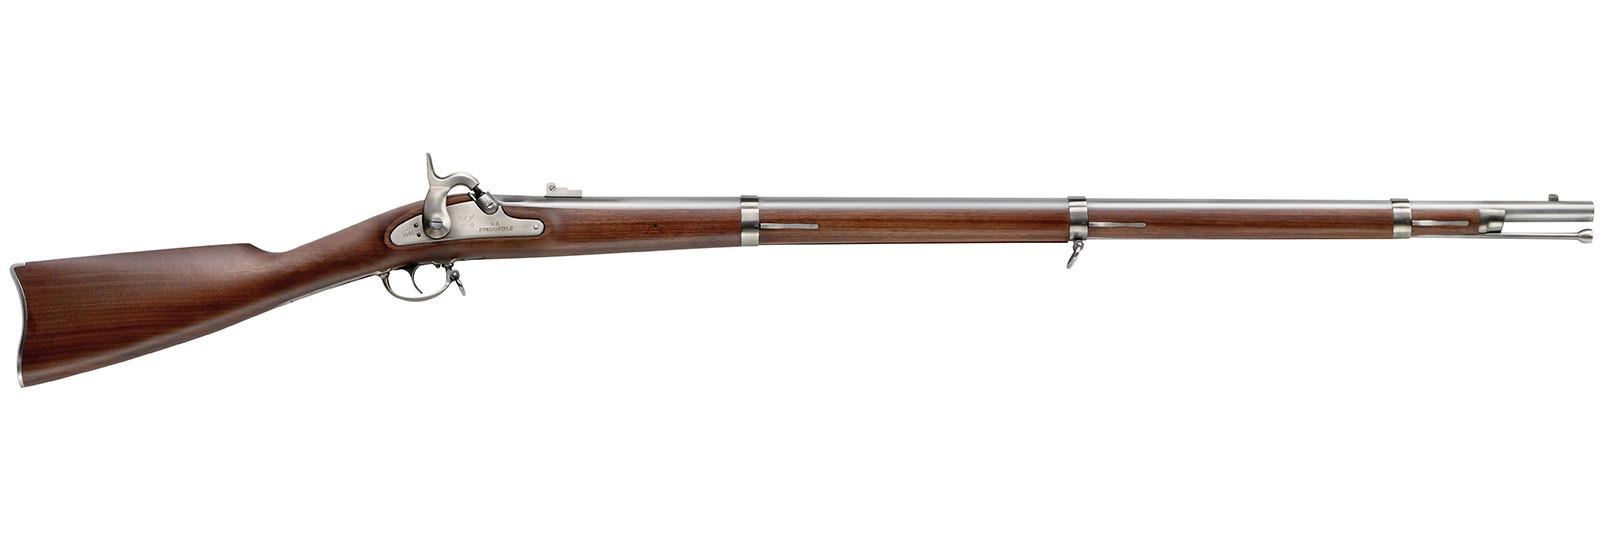 Springfield mod.1861 US Rifle